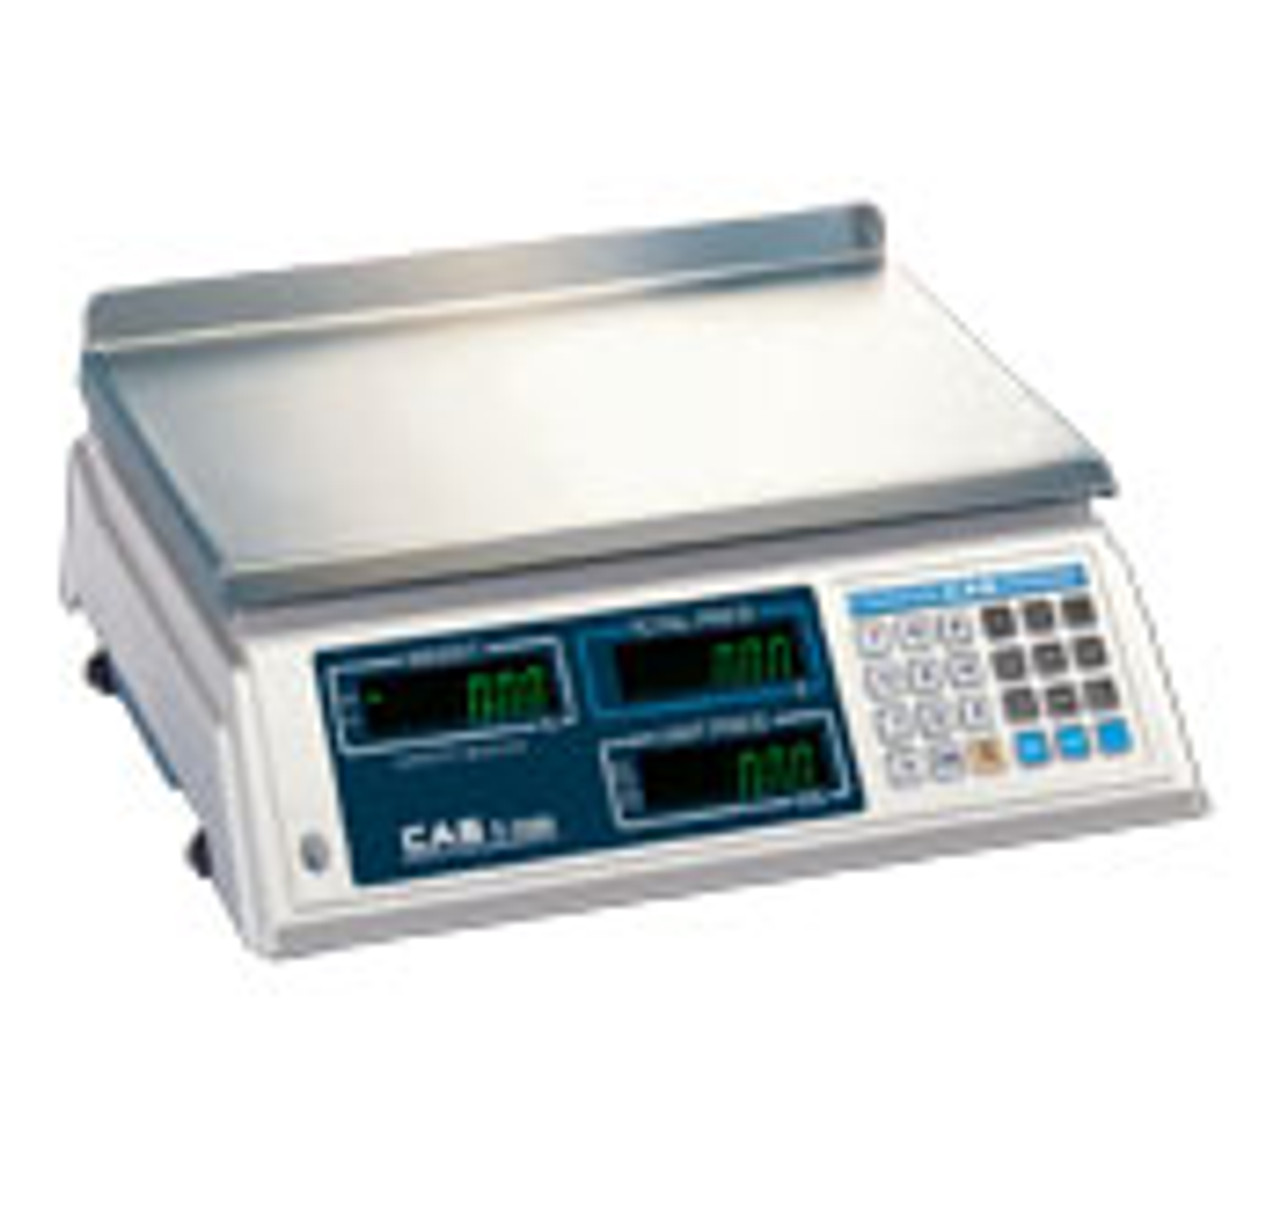 CAS S-2000 Price Computing Scales